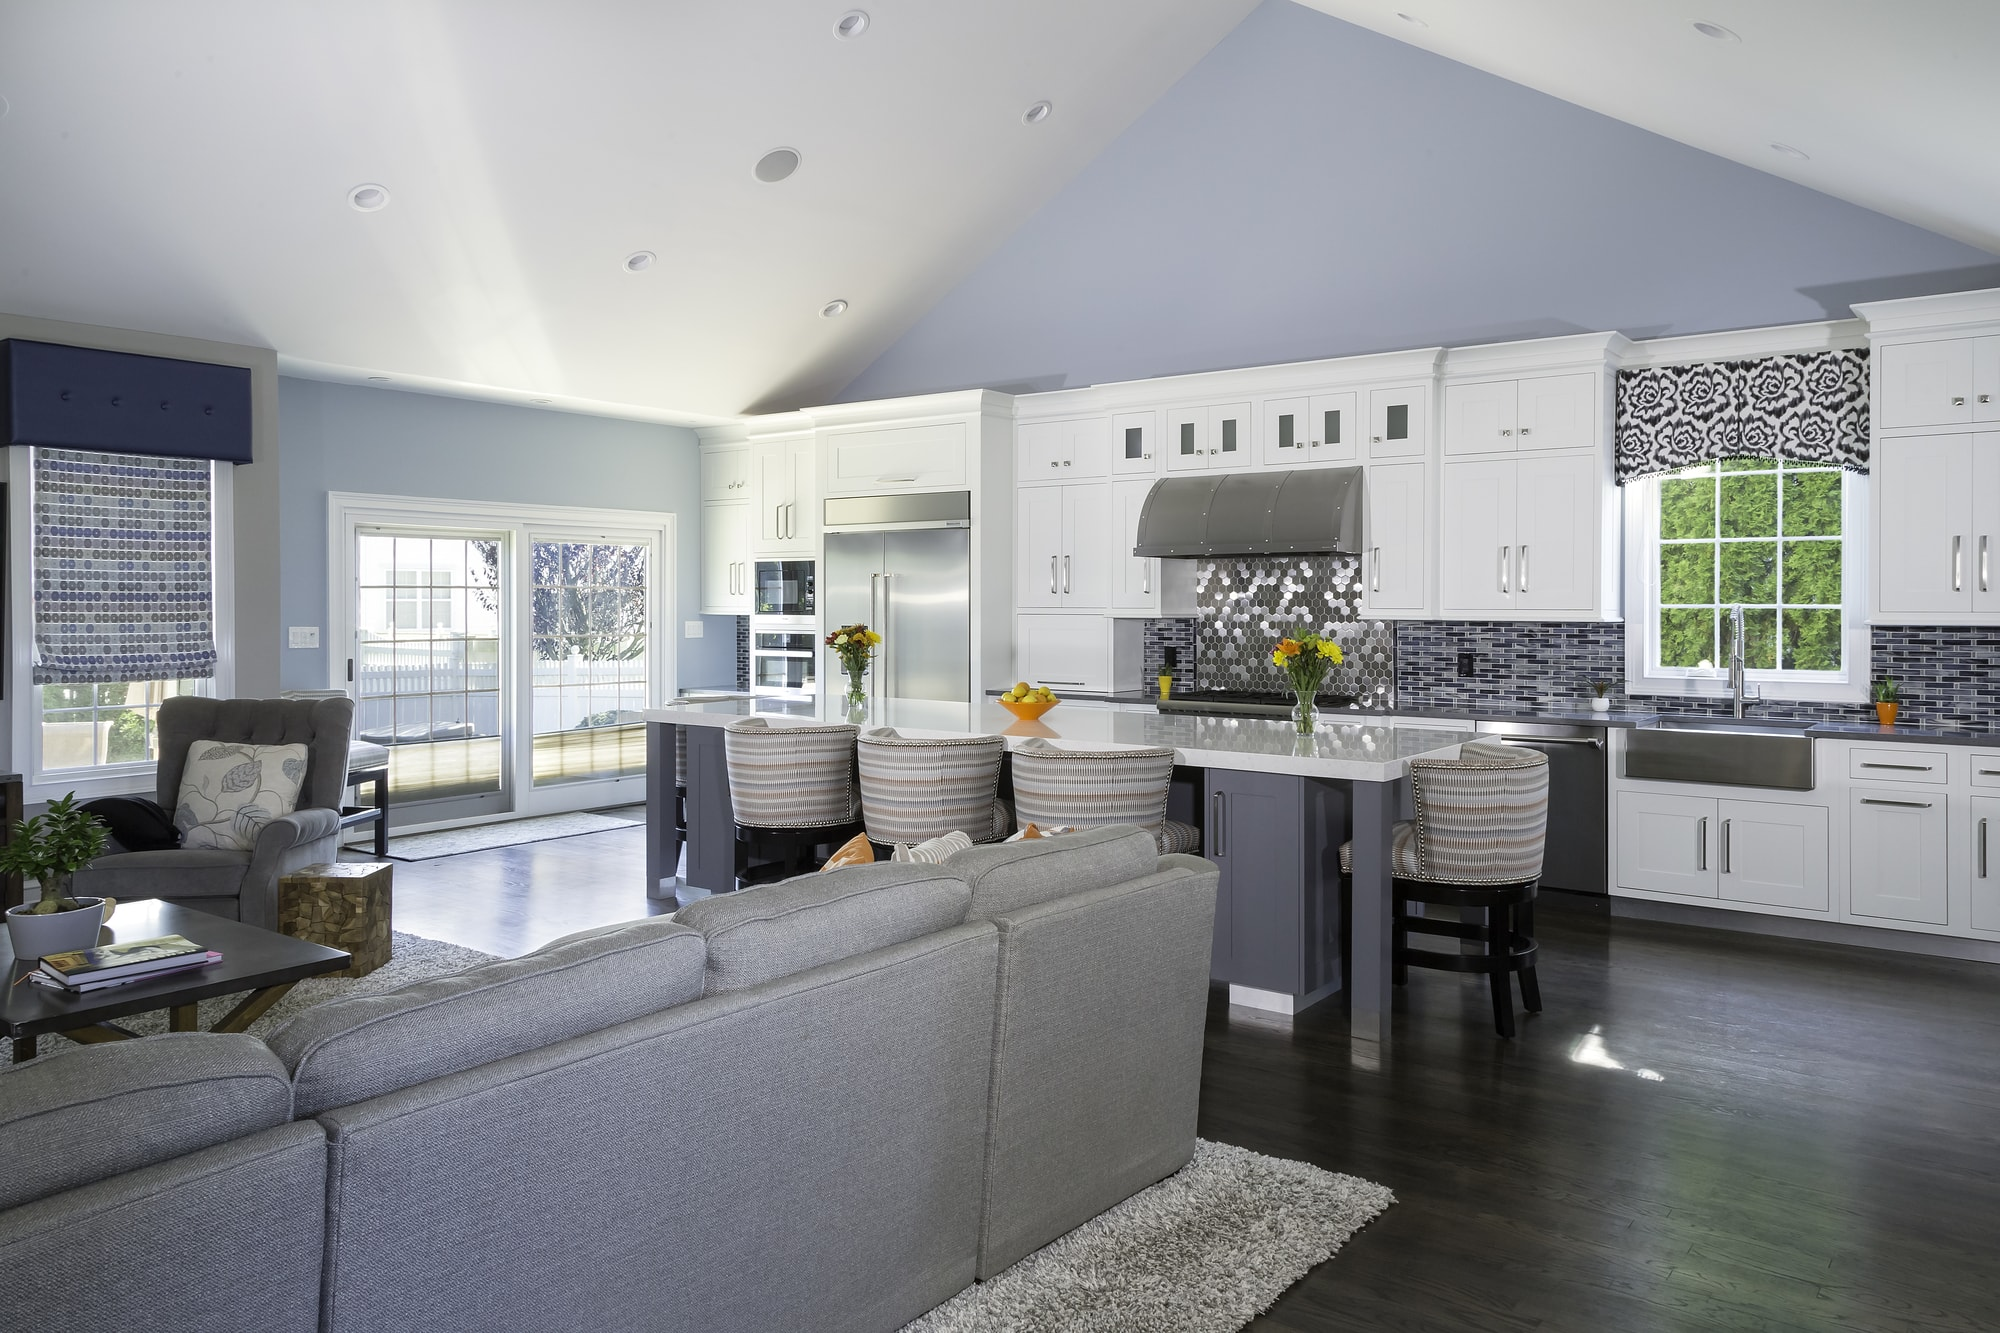 Transitional style kitchen with open plan kitchen design